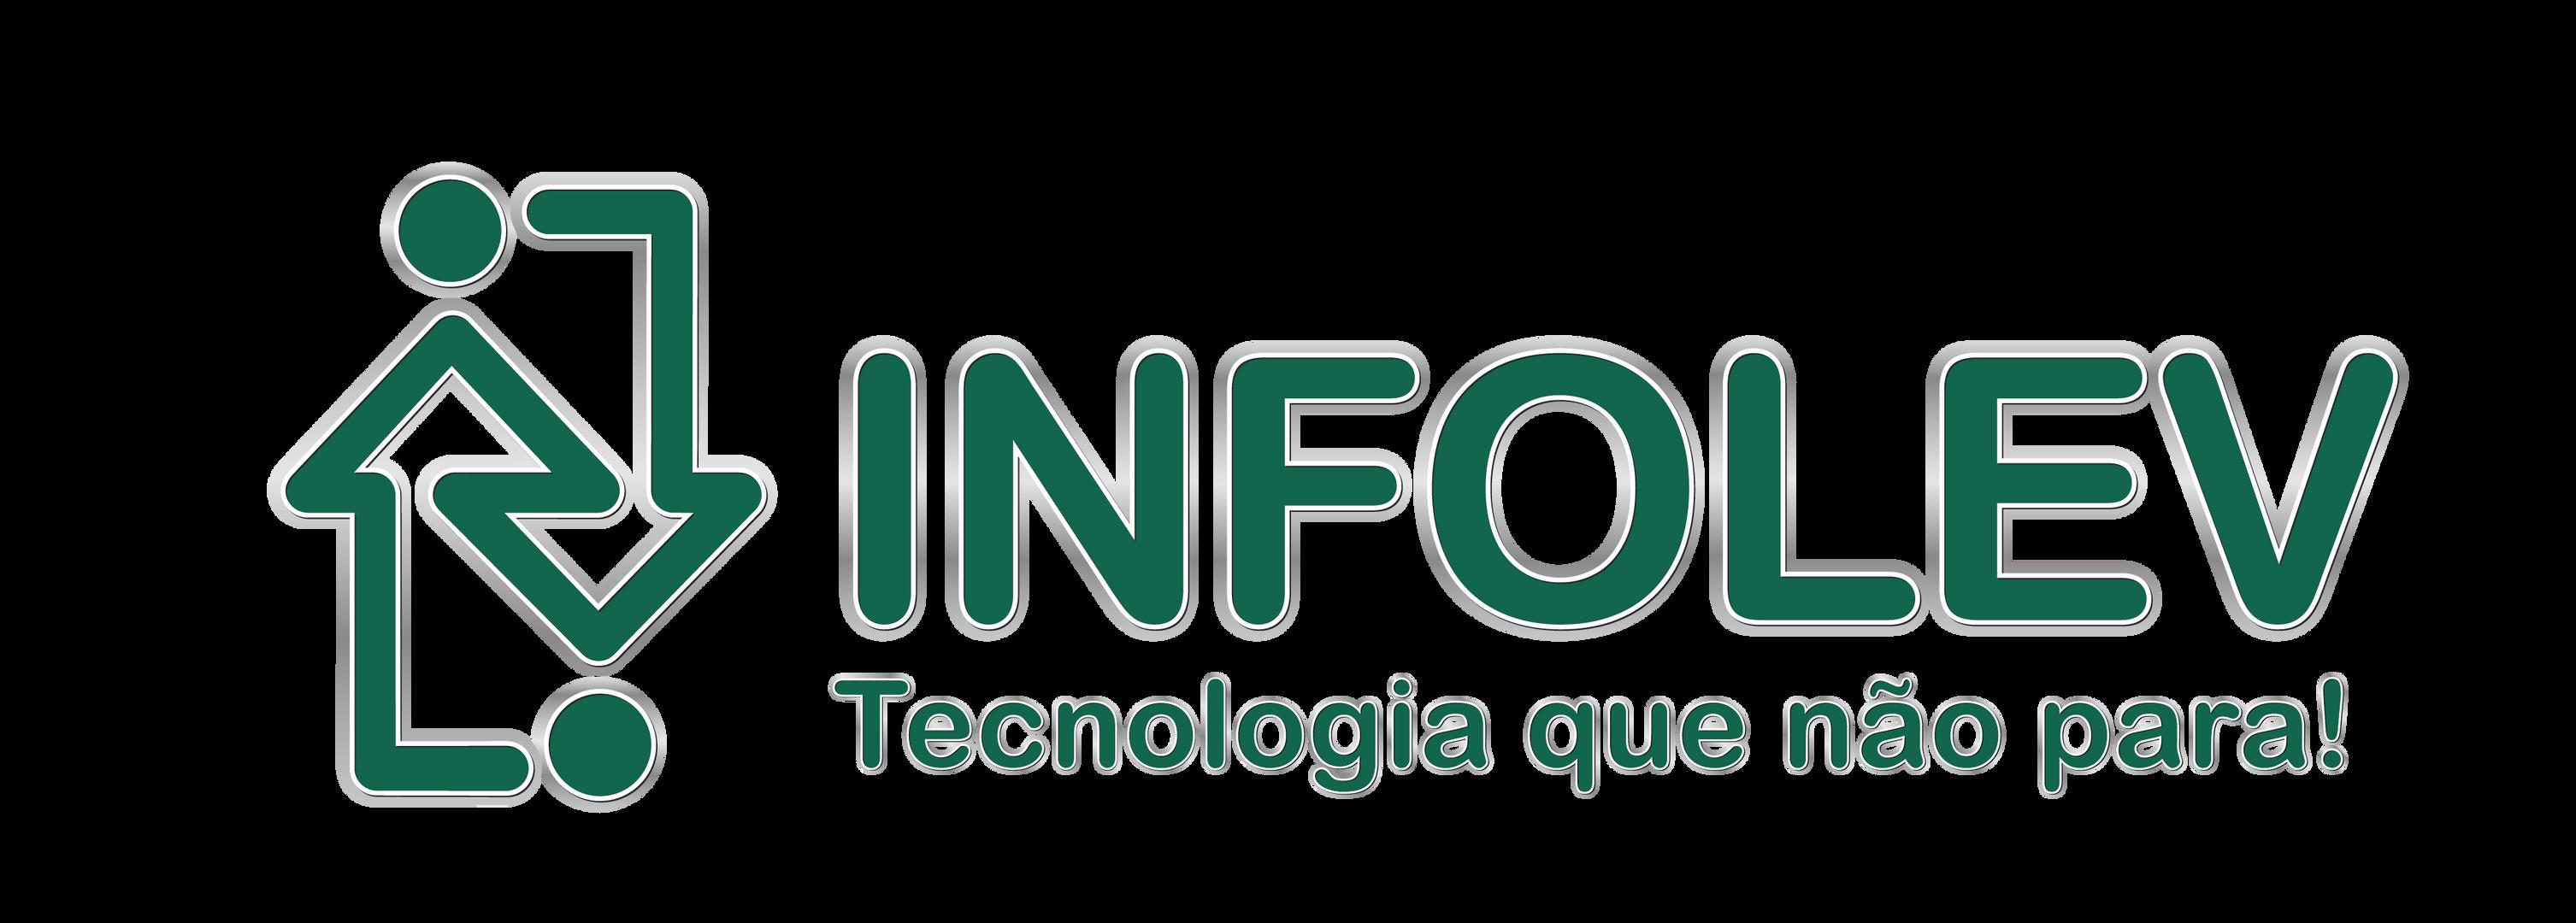 Logo_Principal-01.png